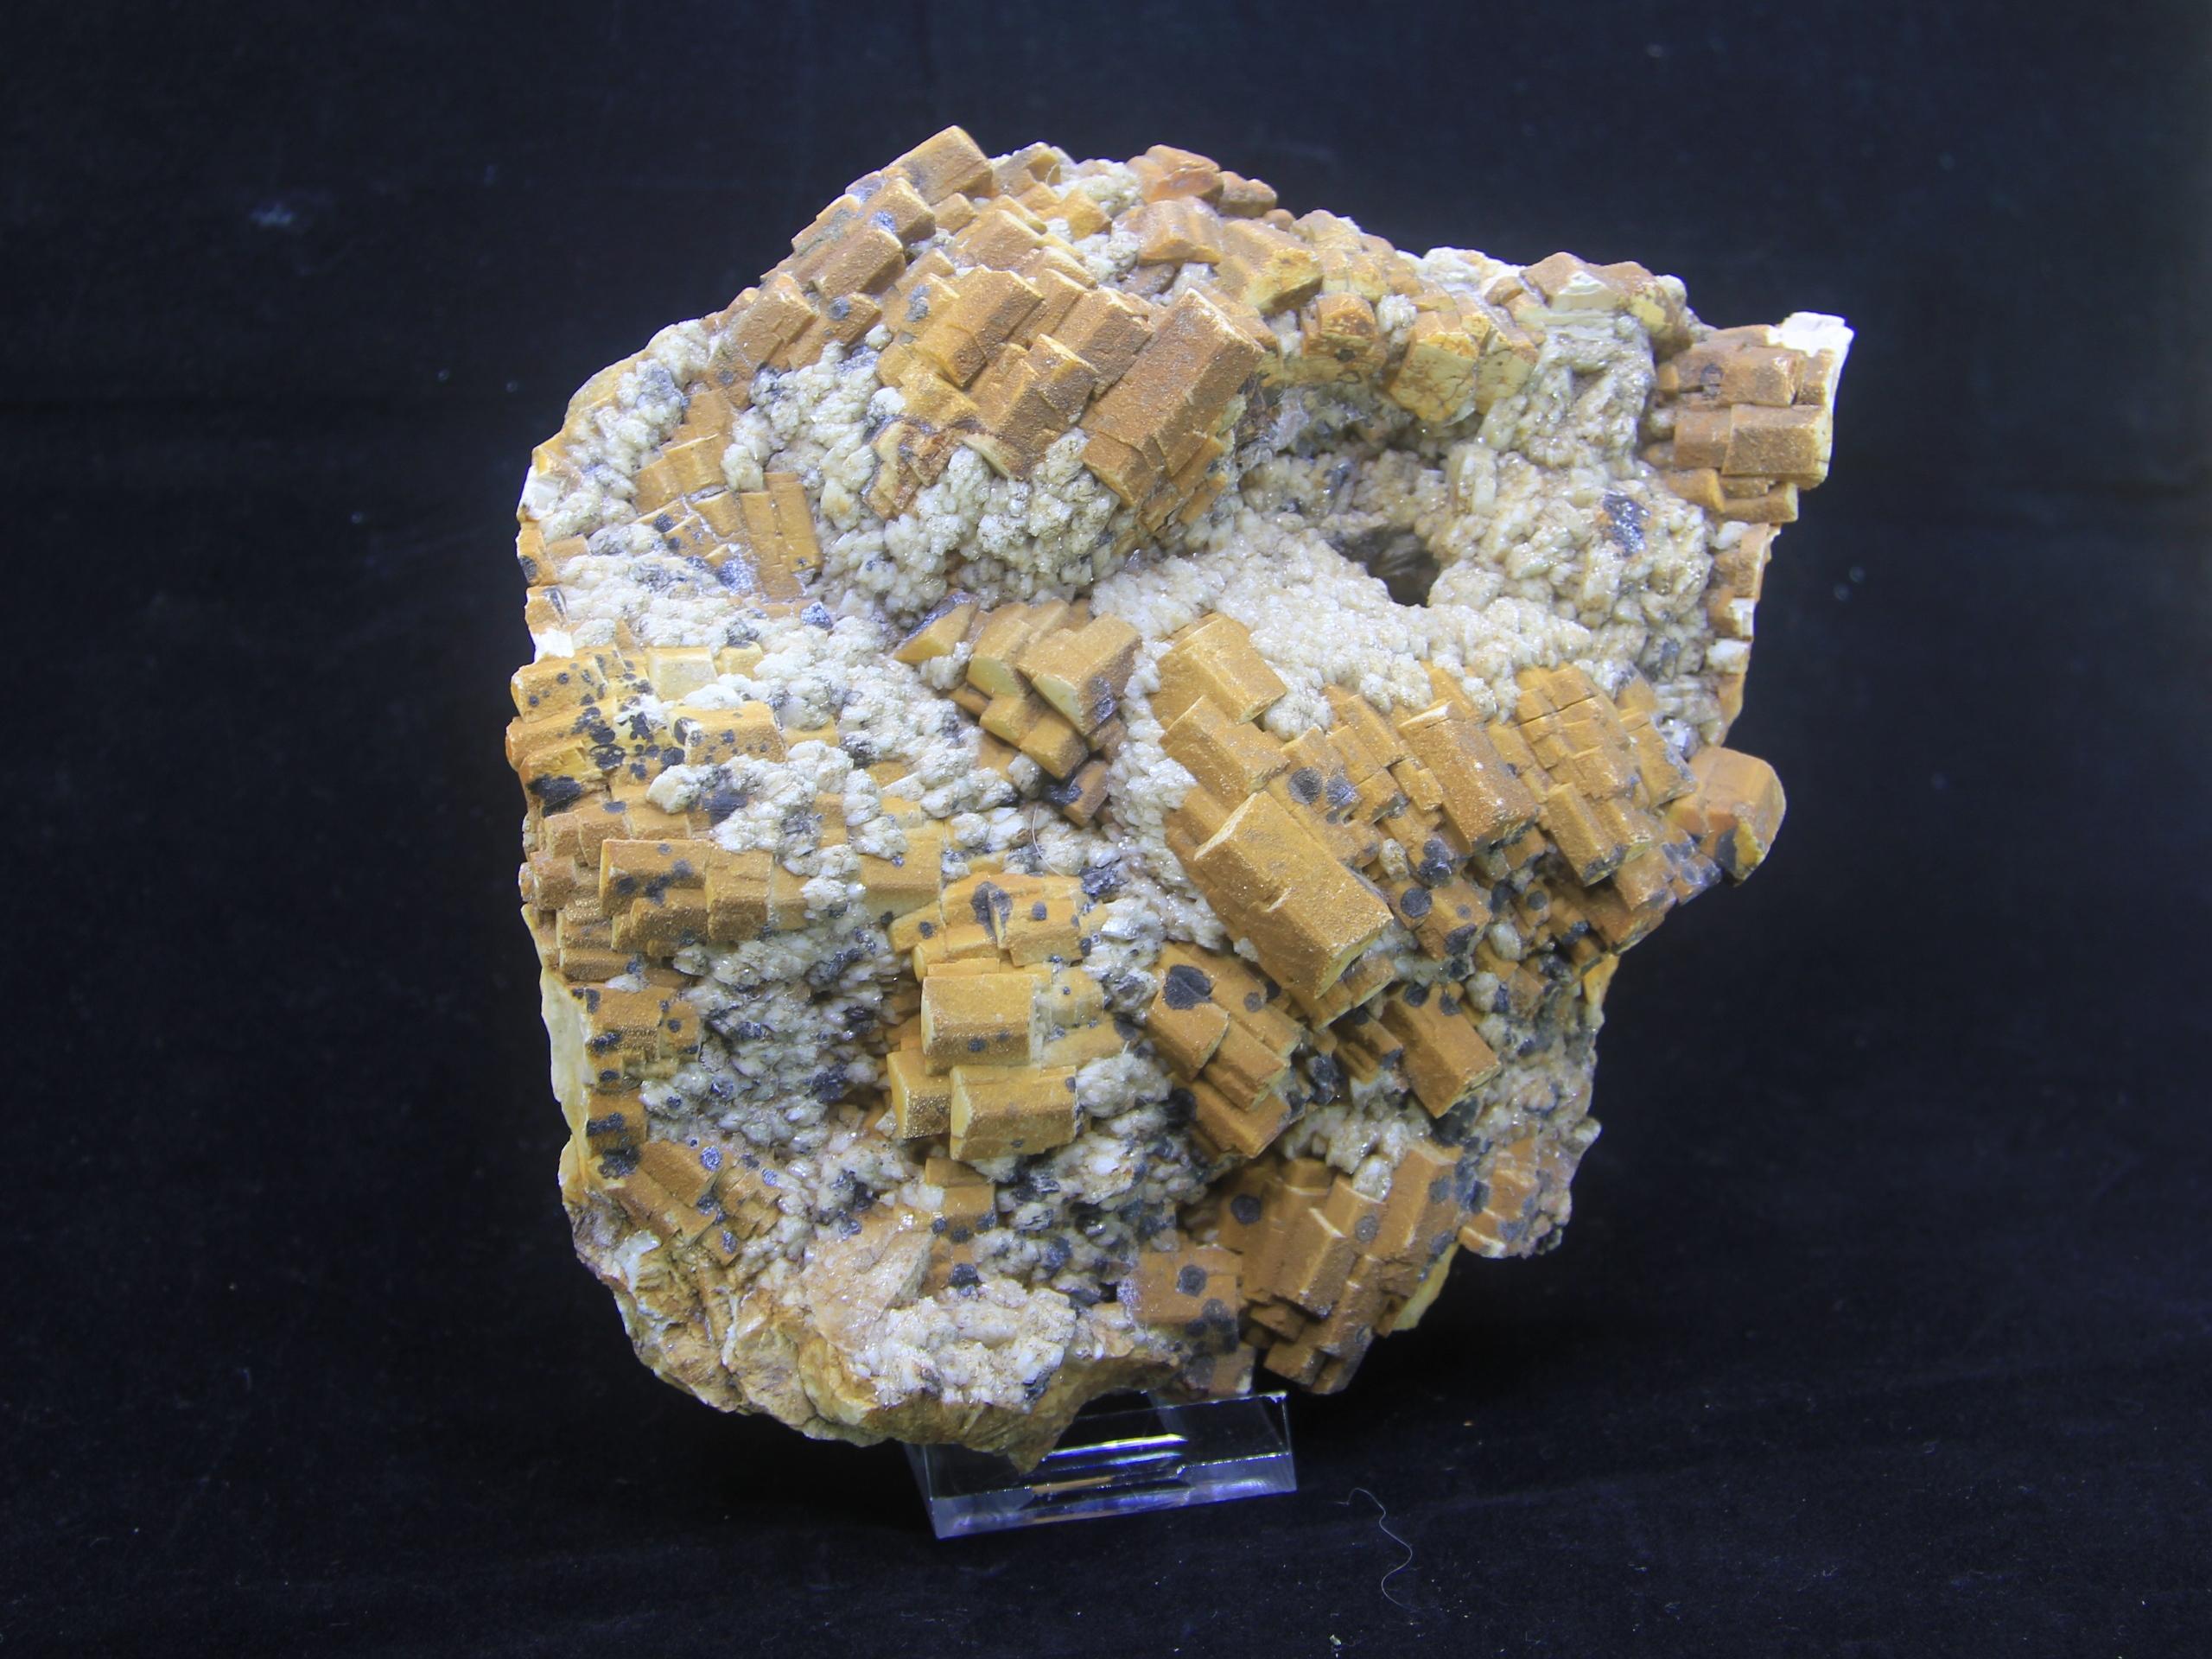 Microcline